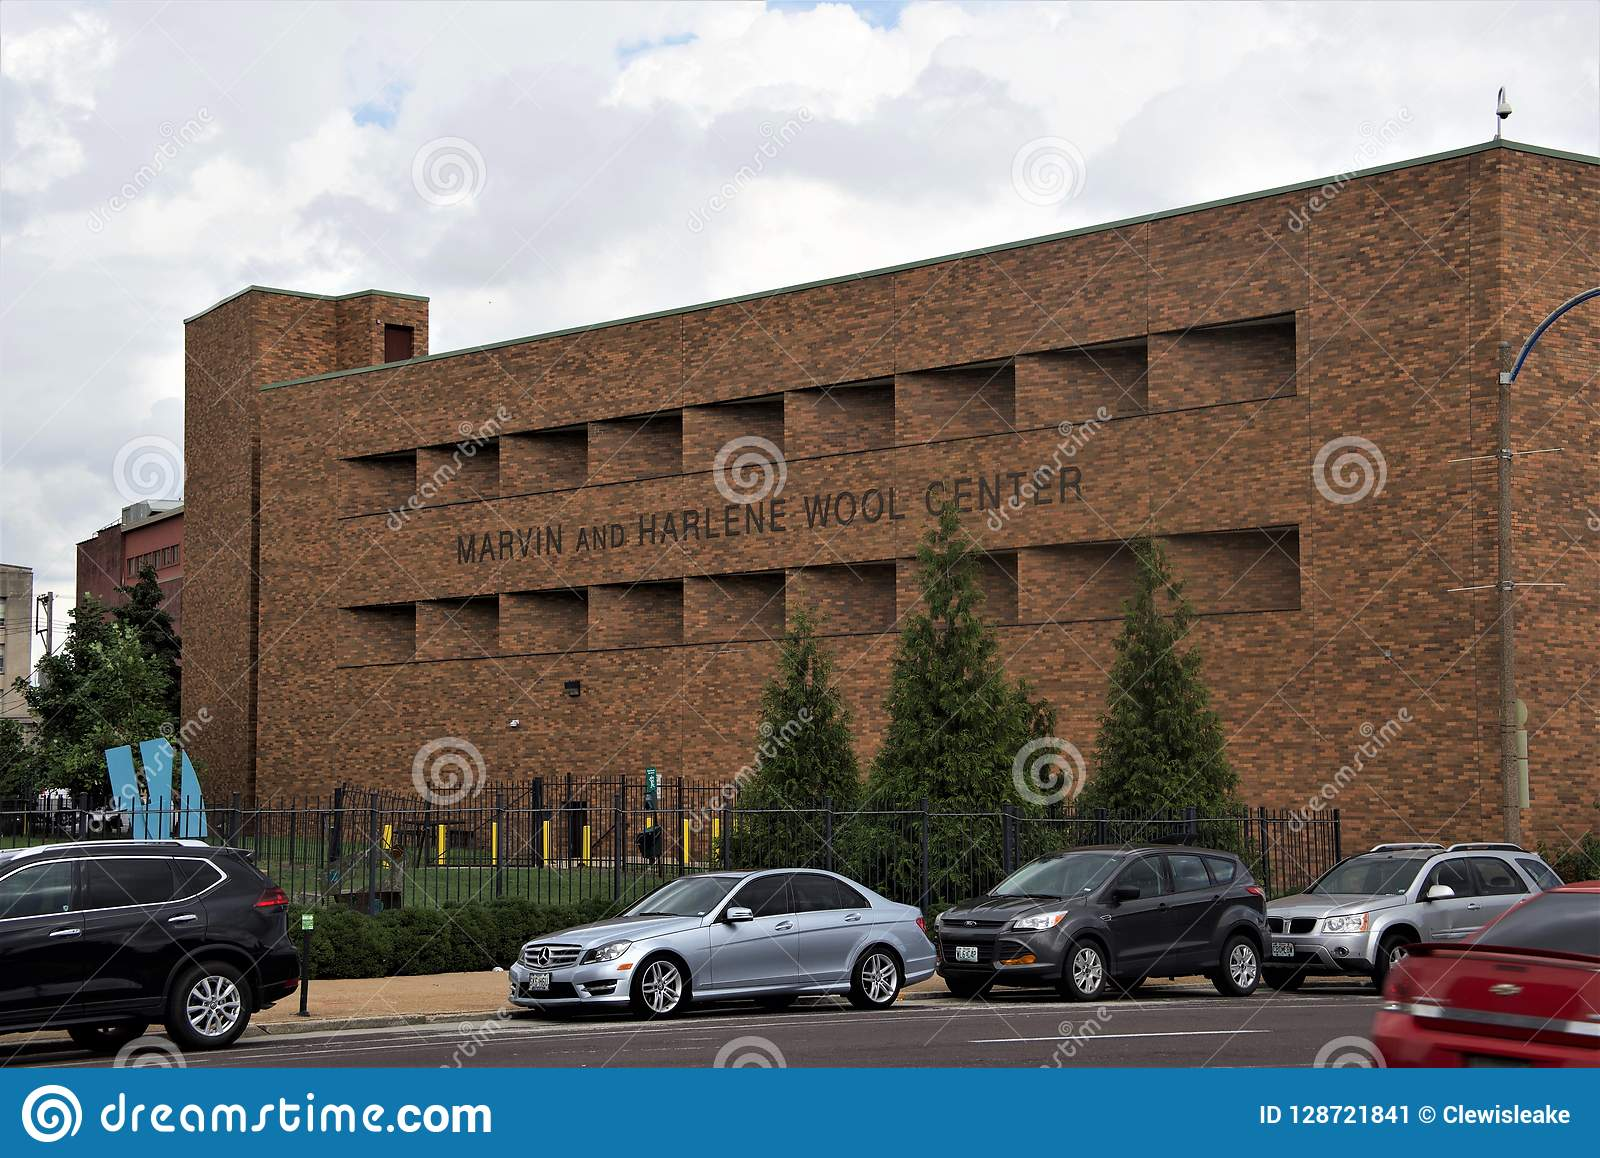 Marvin i Harlene wełny centrum saint louis Uniwersytecki wejście, St Louis Missouri